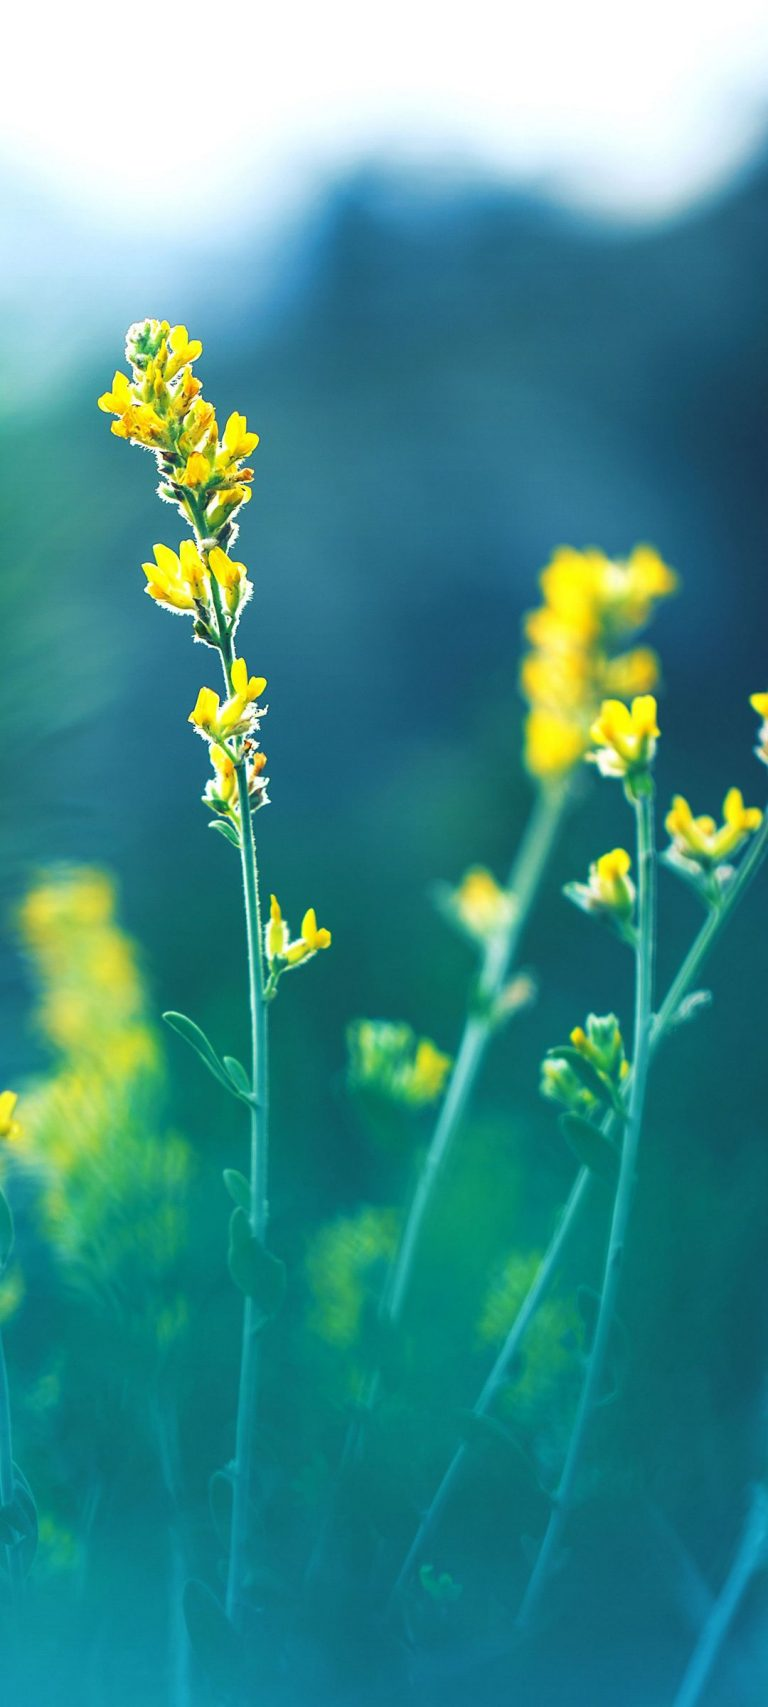 Yellow Flowers Blur 1080x2400 768x1707